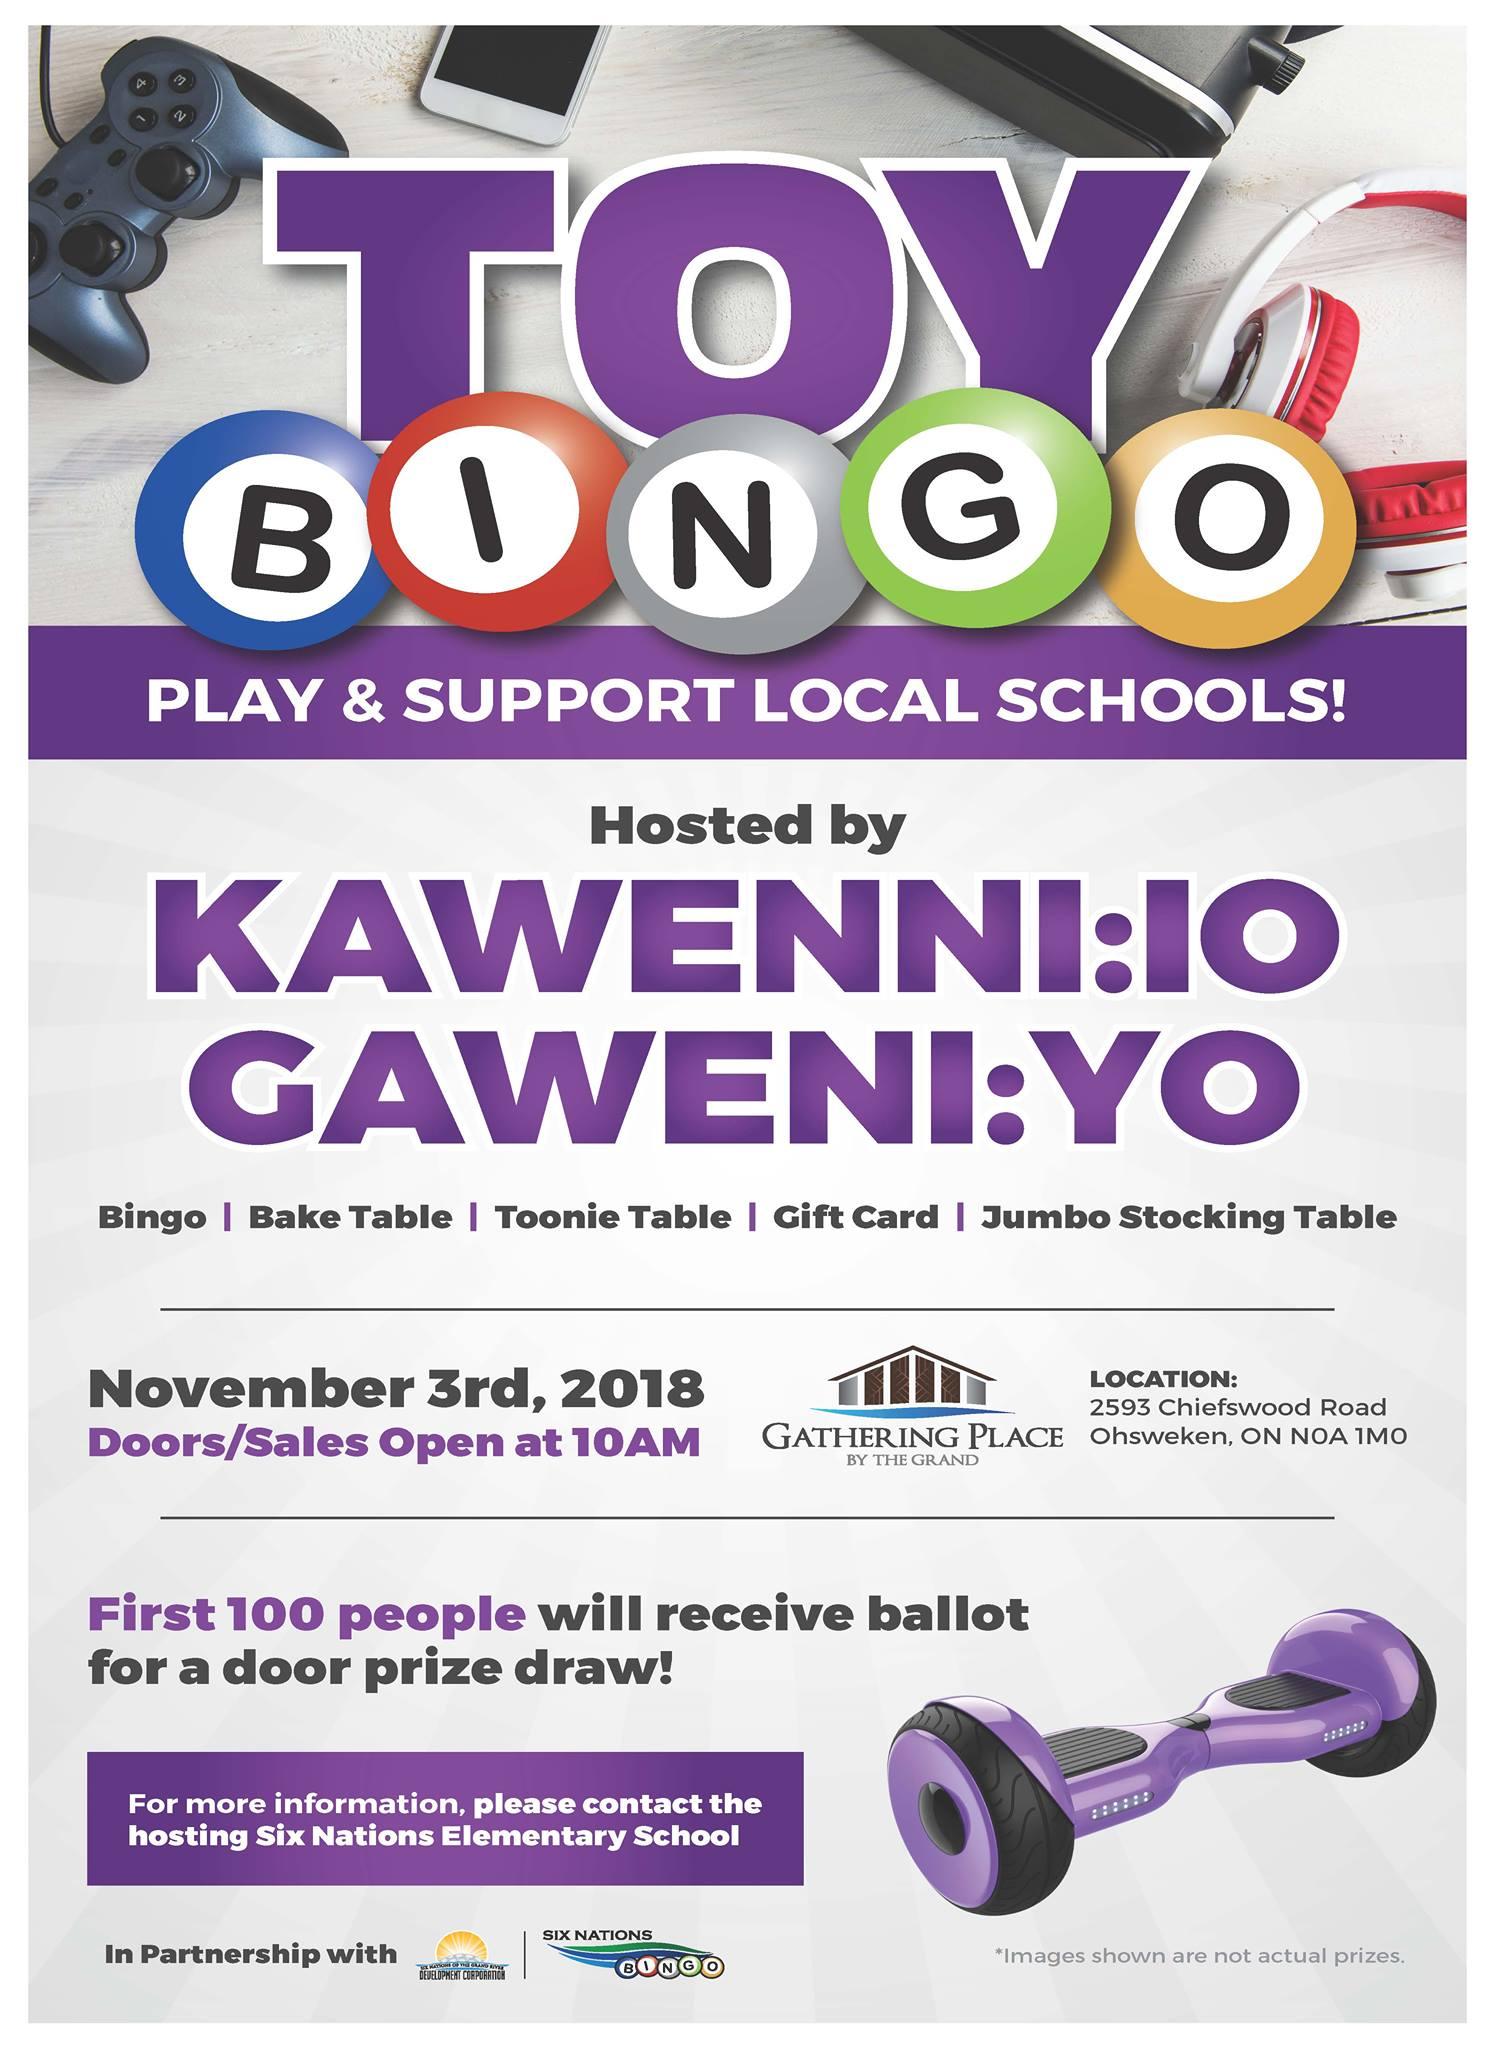 Six Nations Bingo Presents Toy Bingo in Support of Kawenn:io